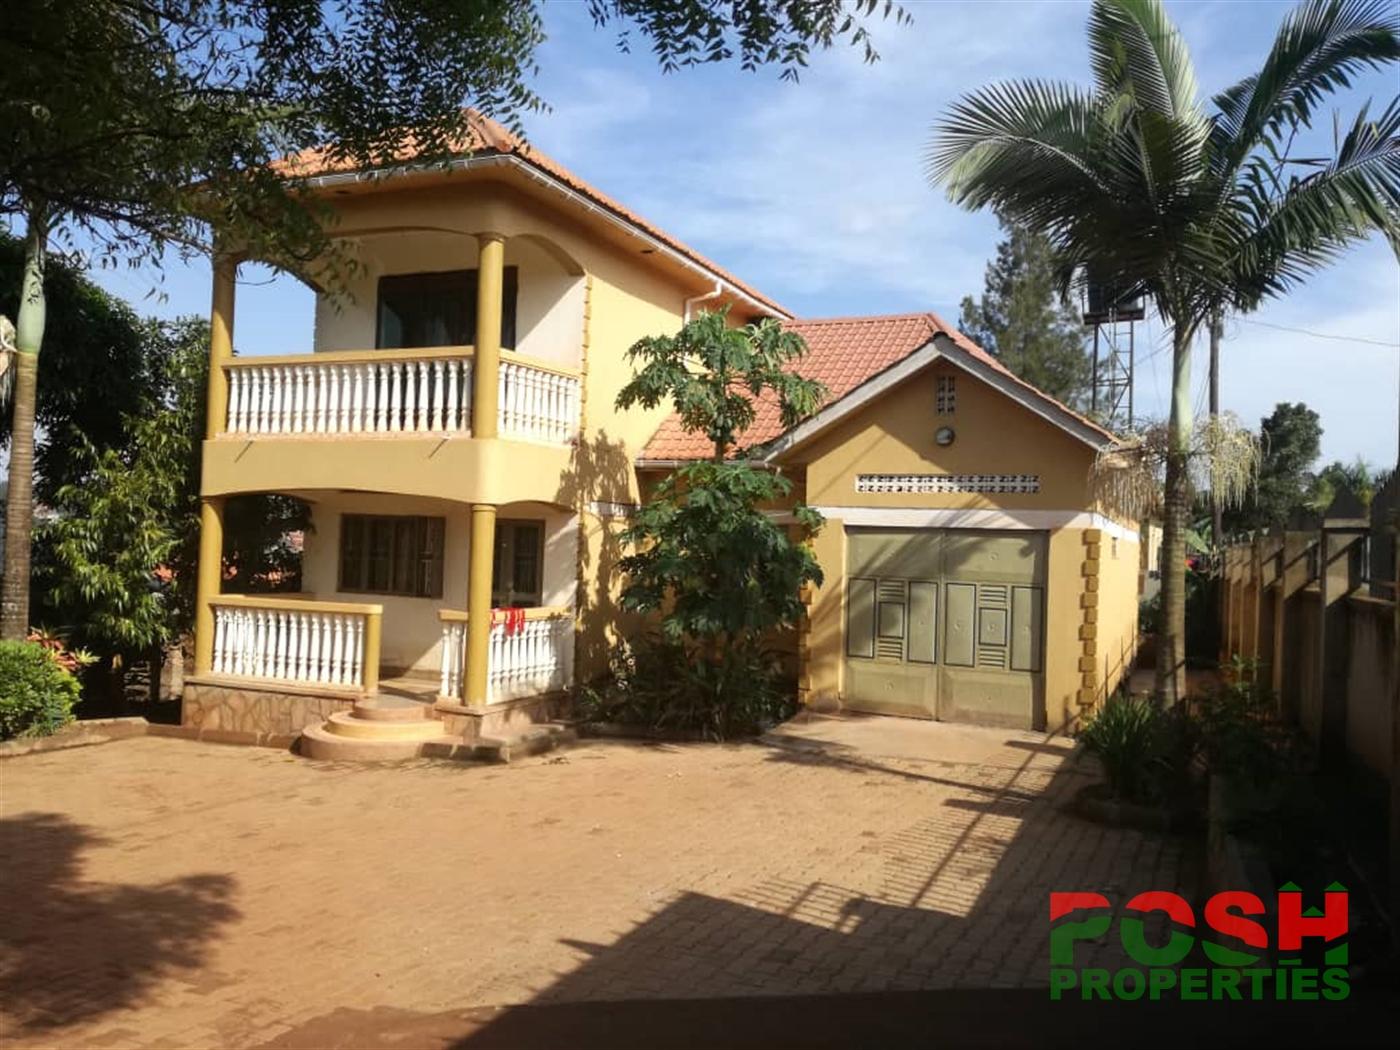 Mansion for sale in Nalumunye Kampala